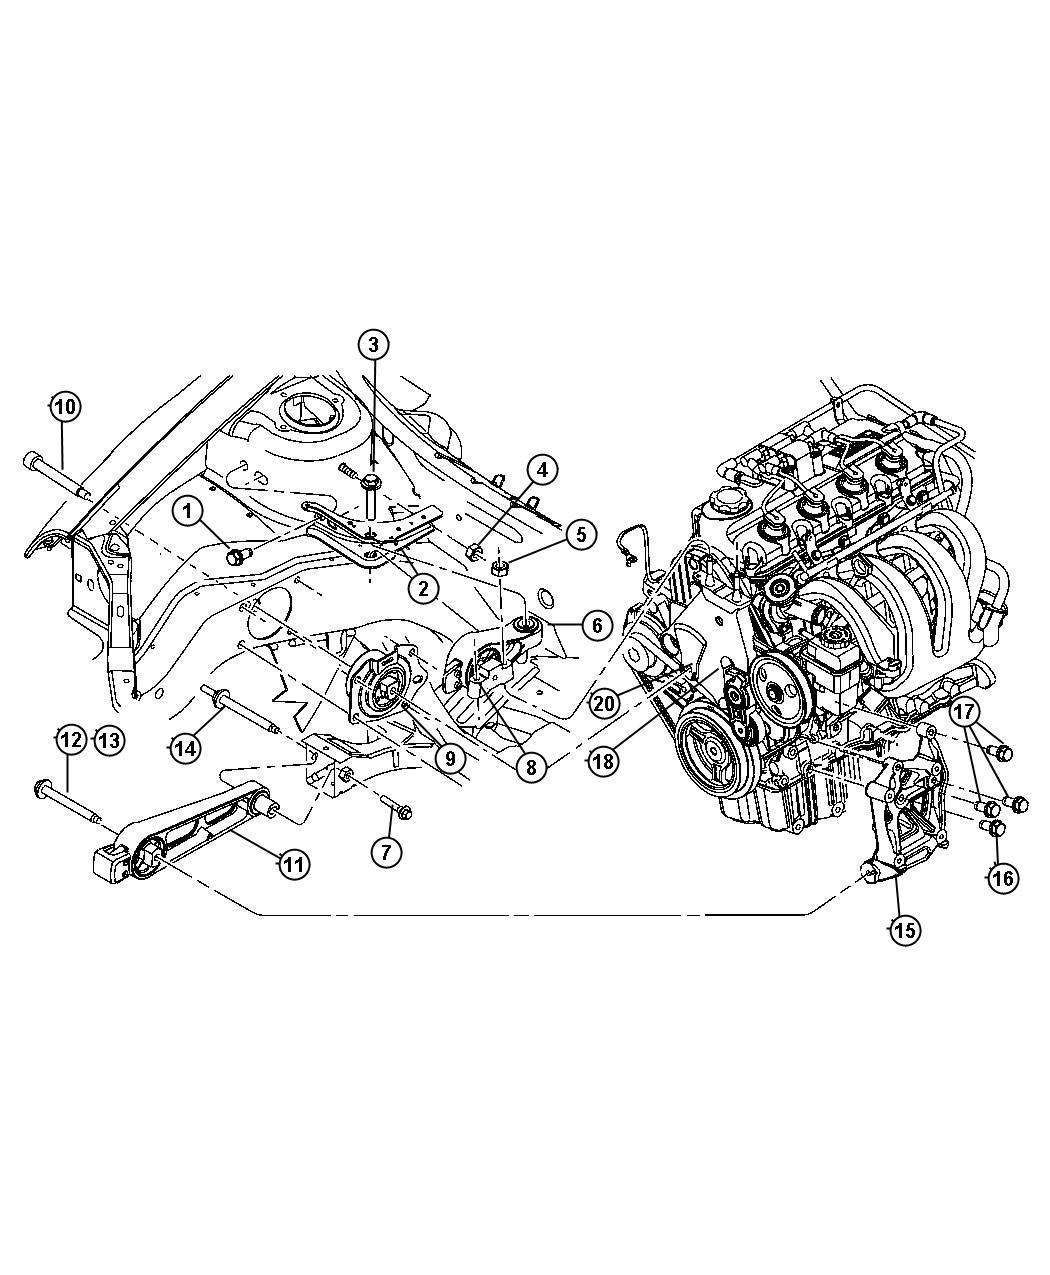 04668364AE  Chrysler Tensioner and bracket Engine mount